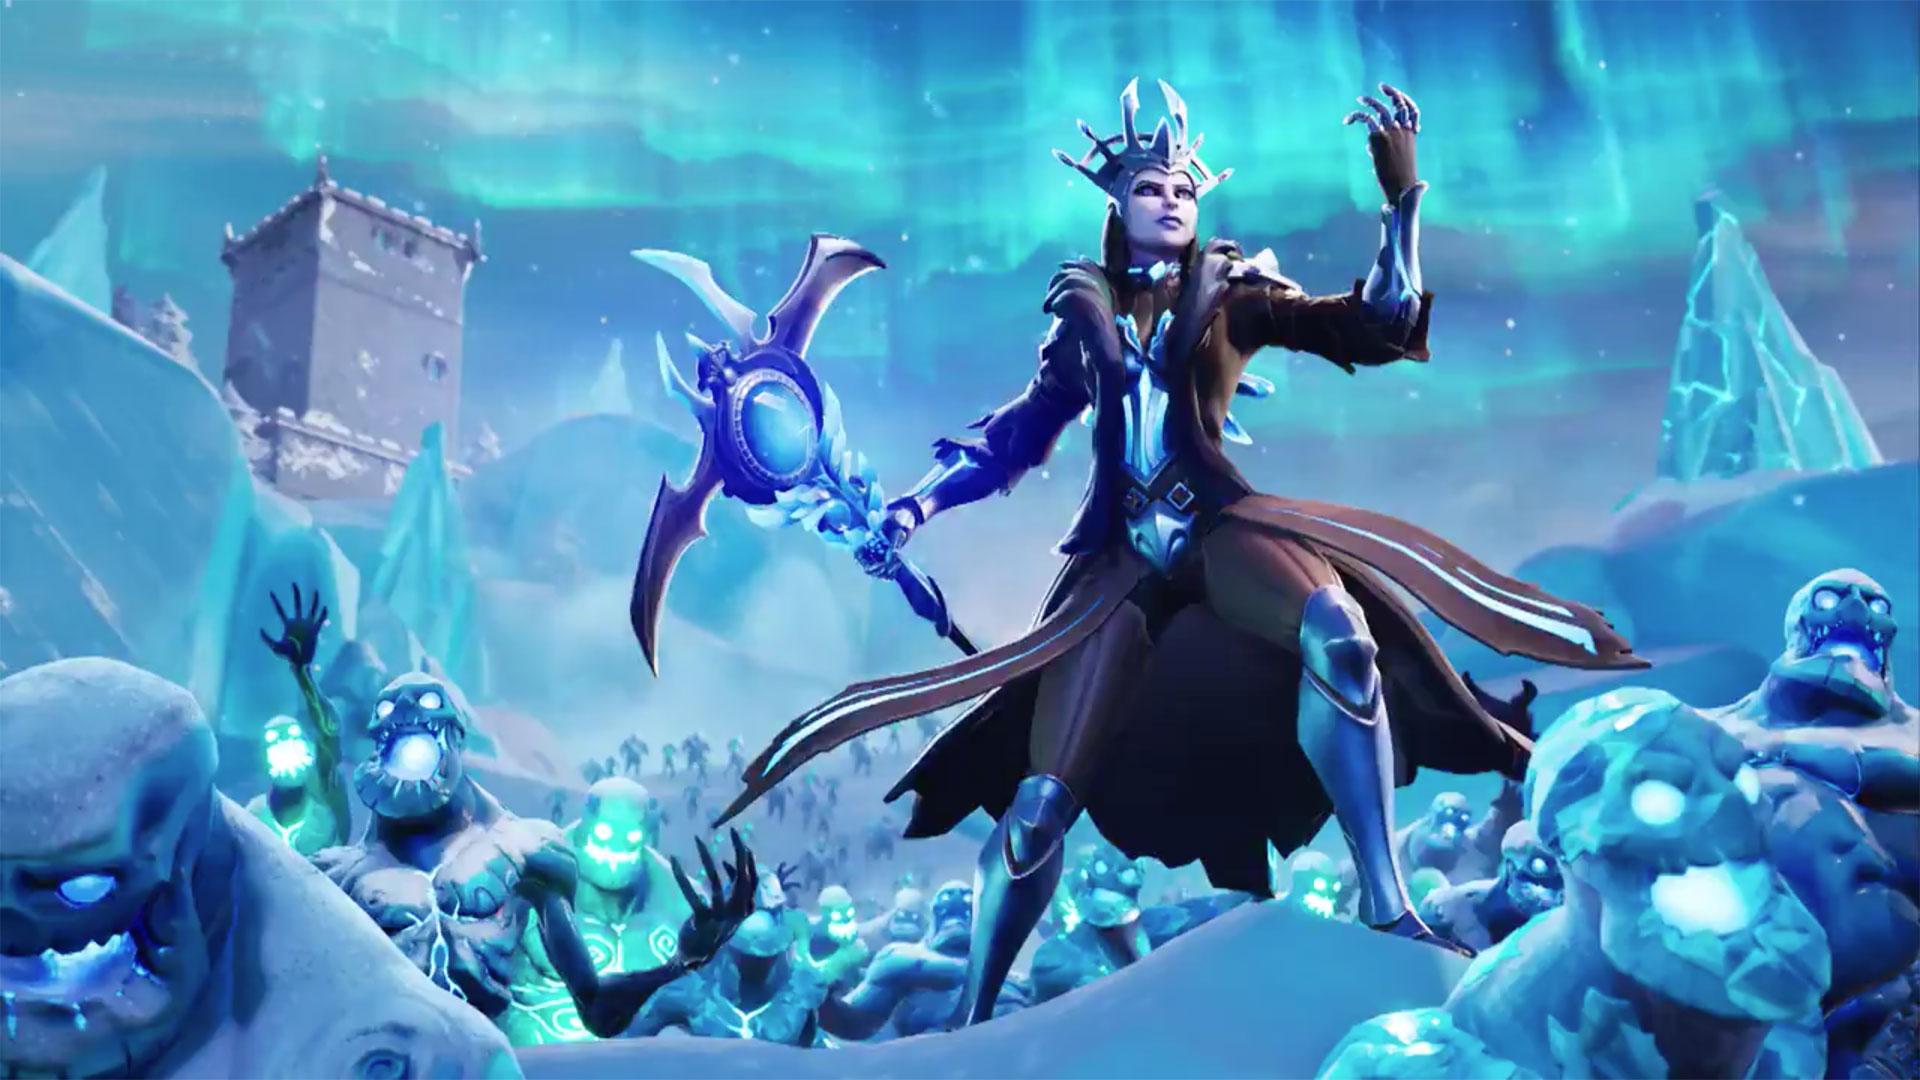 Fortnite Ice Storm Challenges guide | GamesRadar+